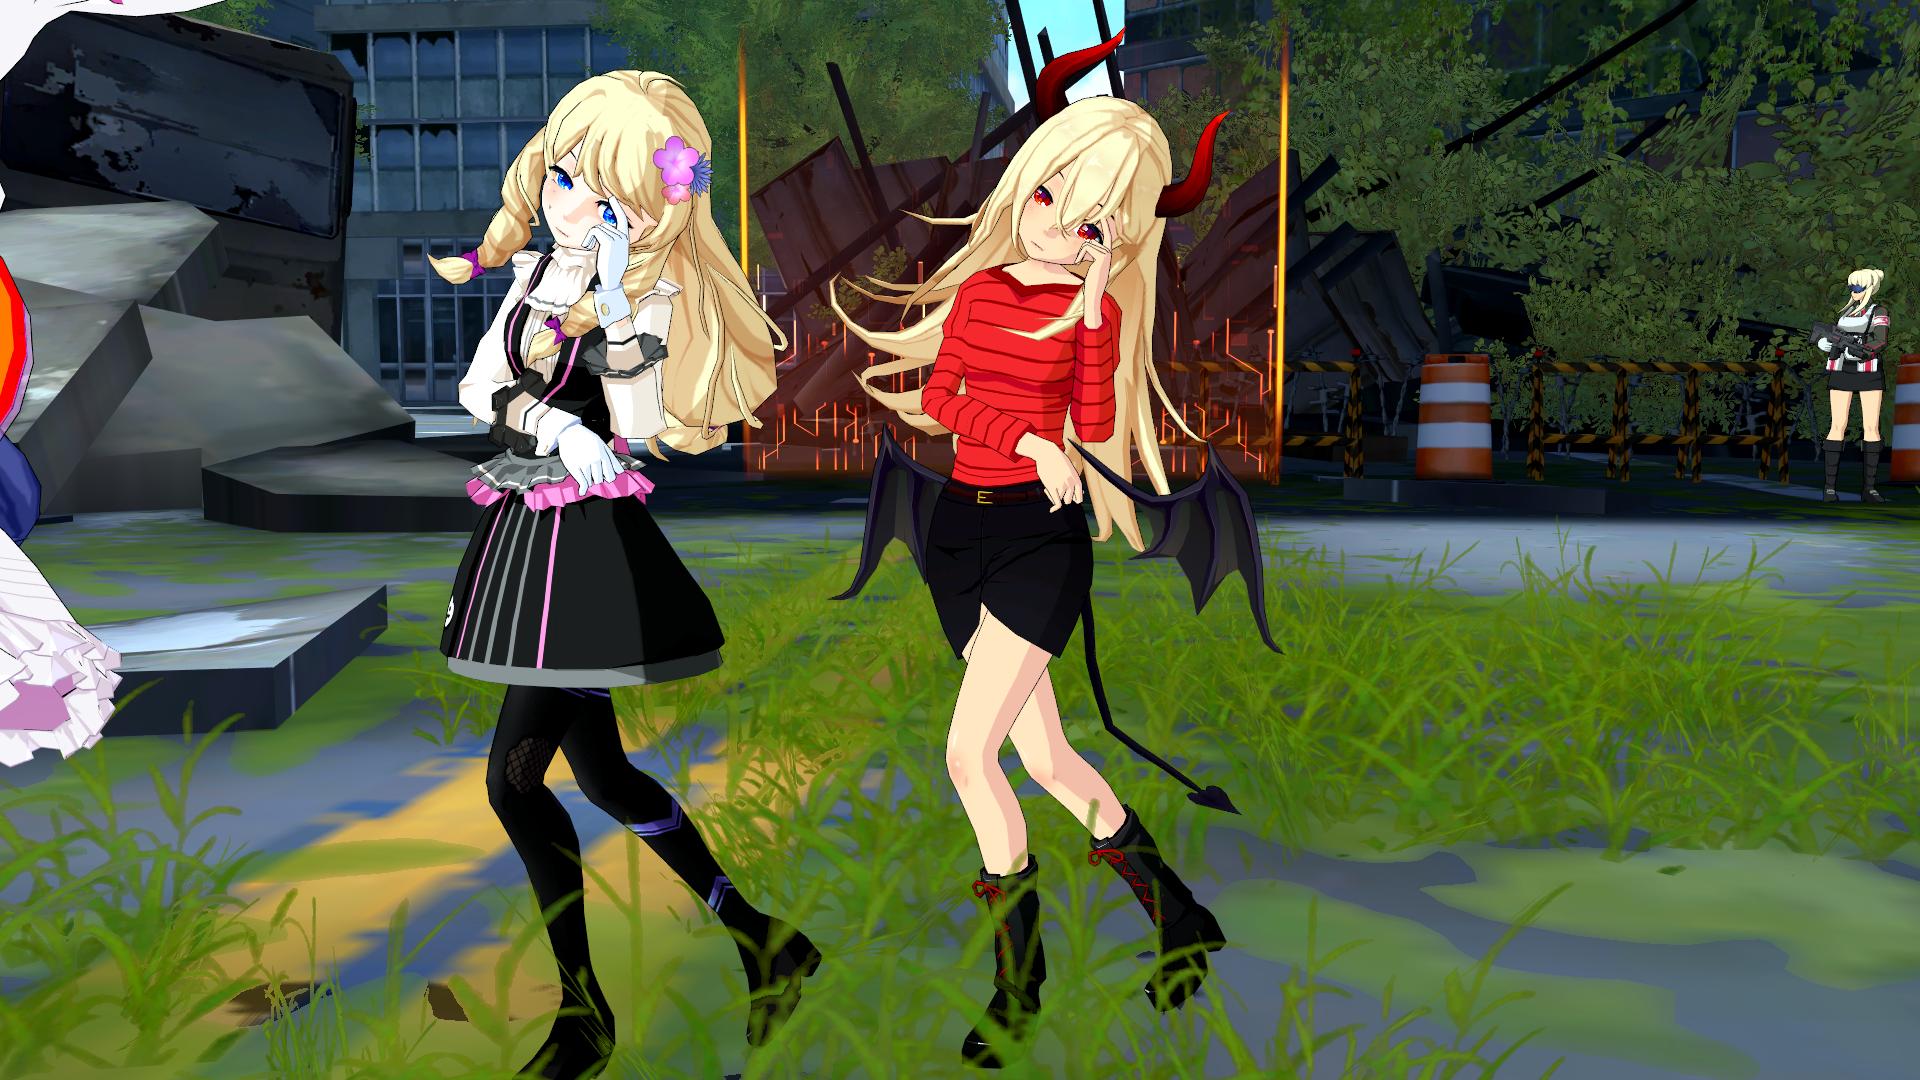 Soulworker_Screenshot_2020.02.23_-_15.49.45.61.png